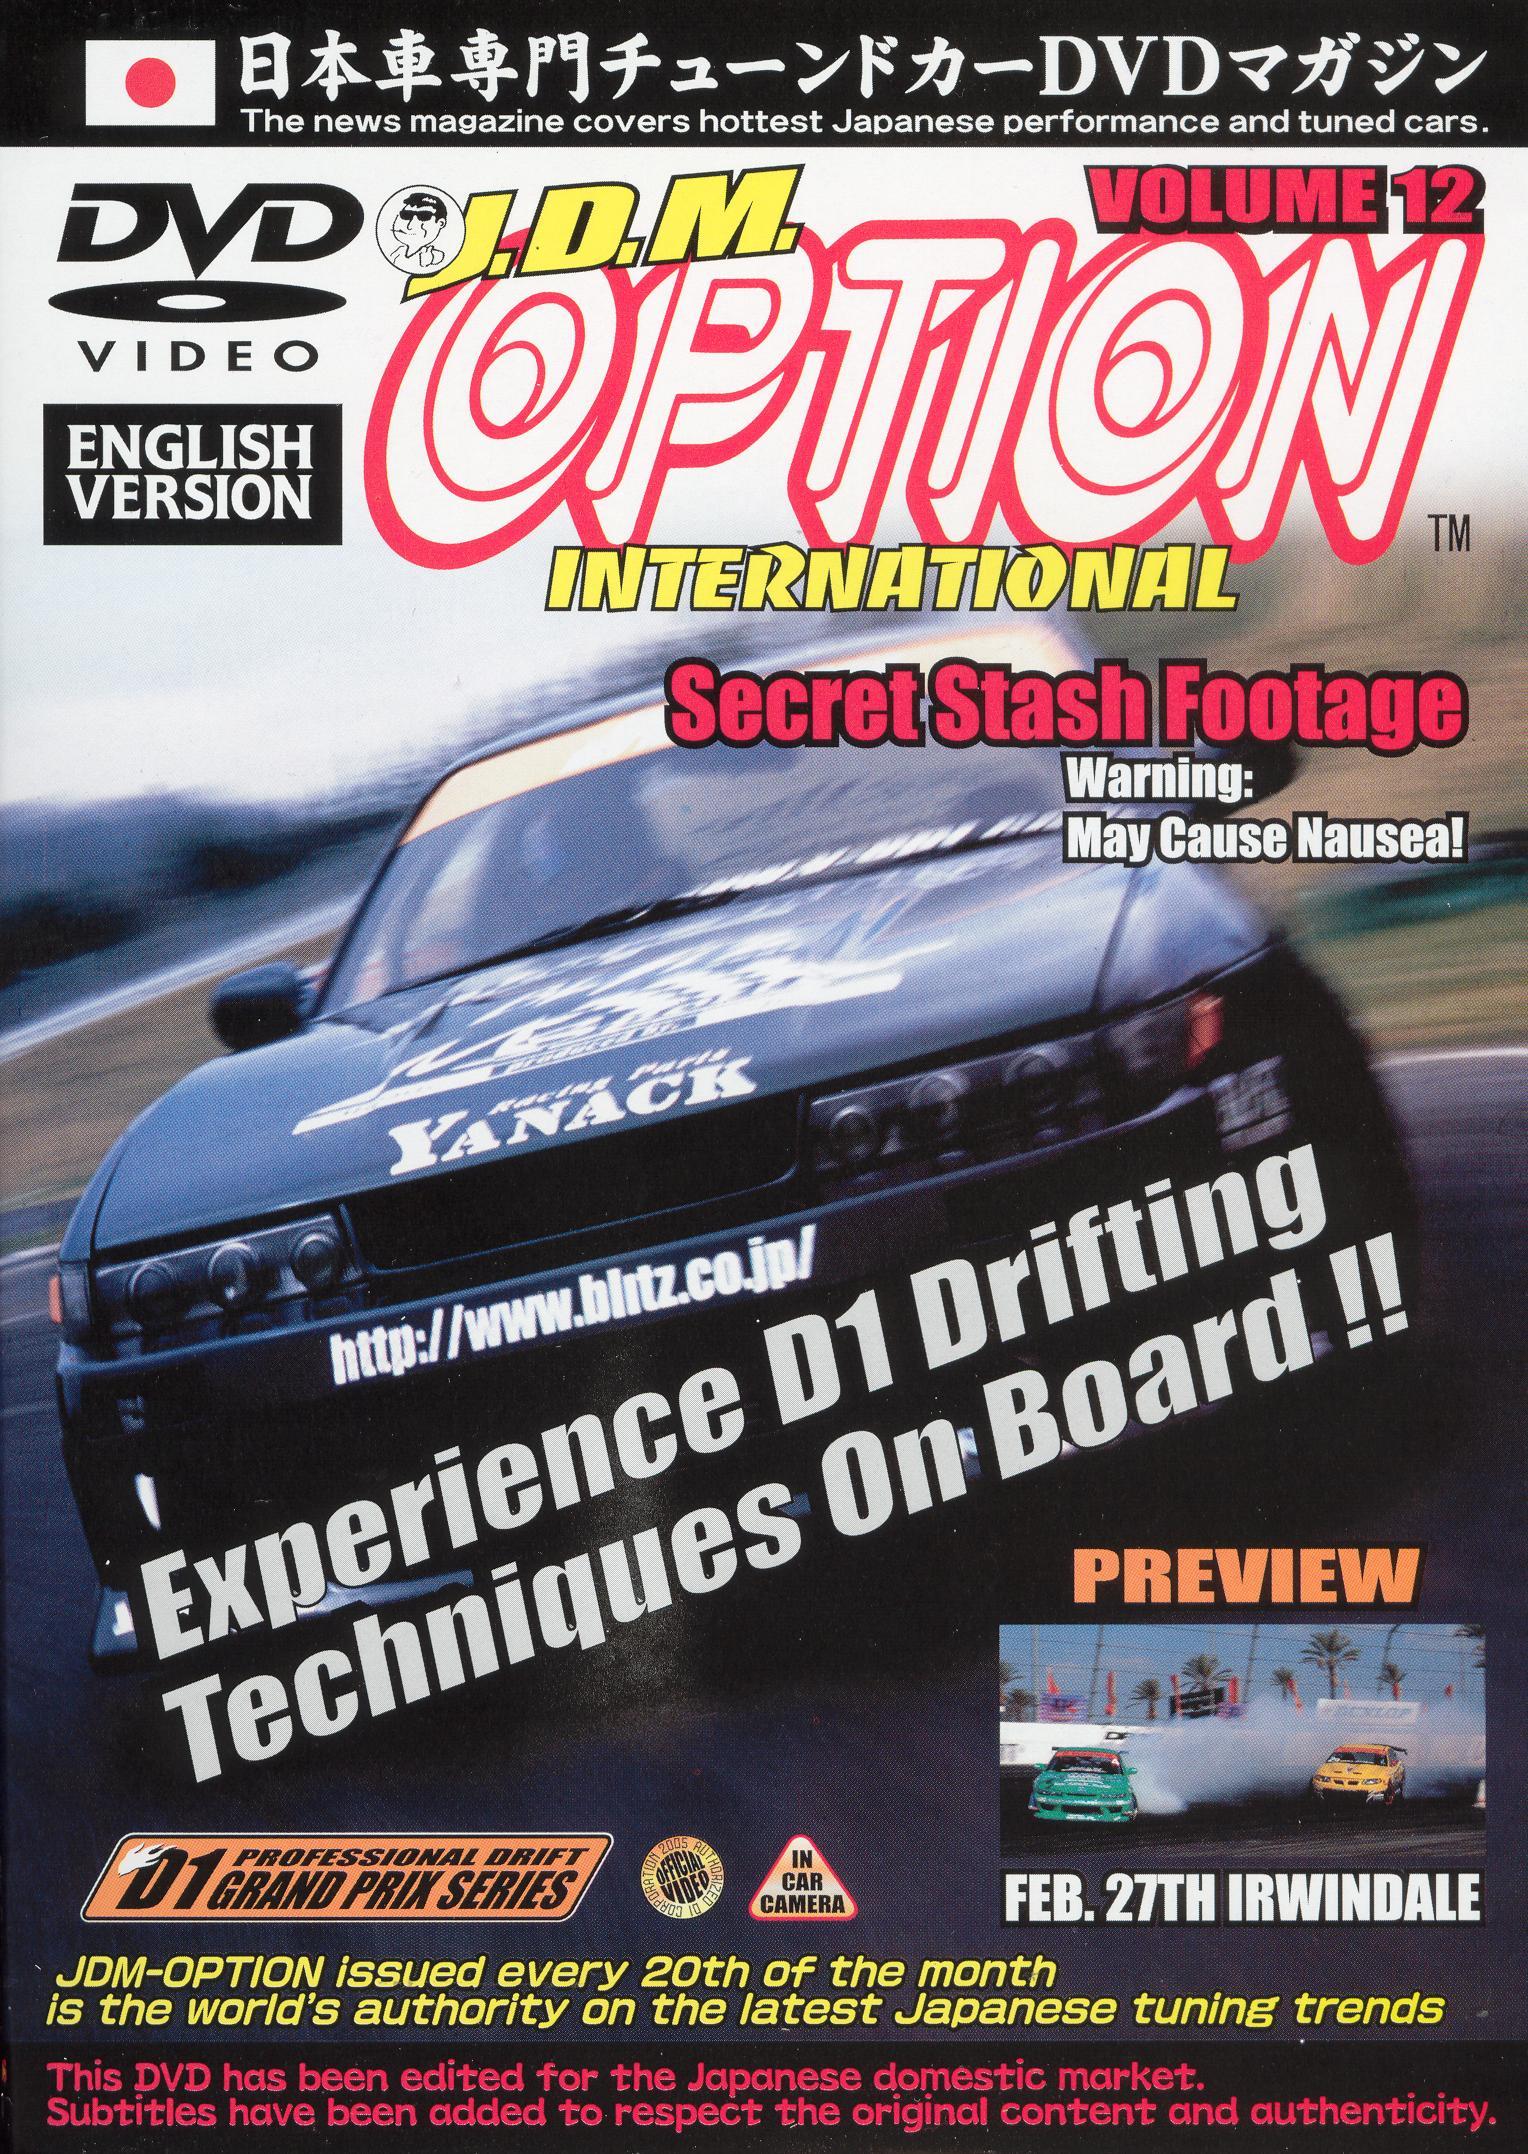 JDM Option, Vol. 12: Pro Drifting - On Board Camera